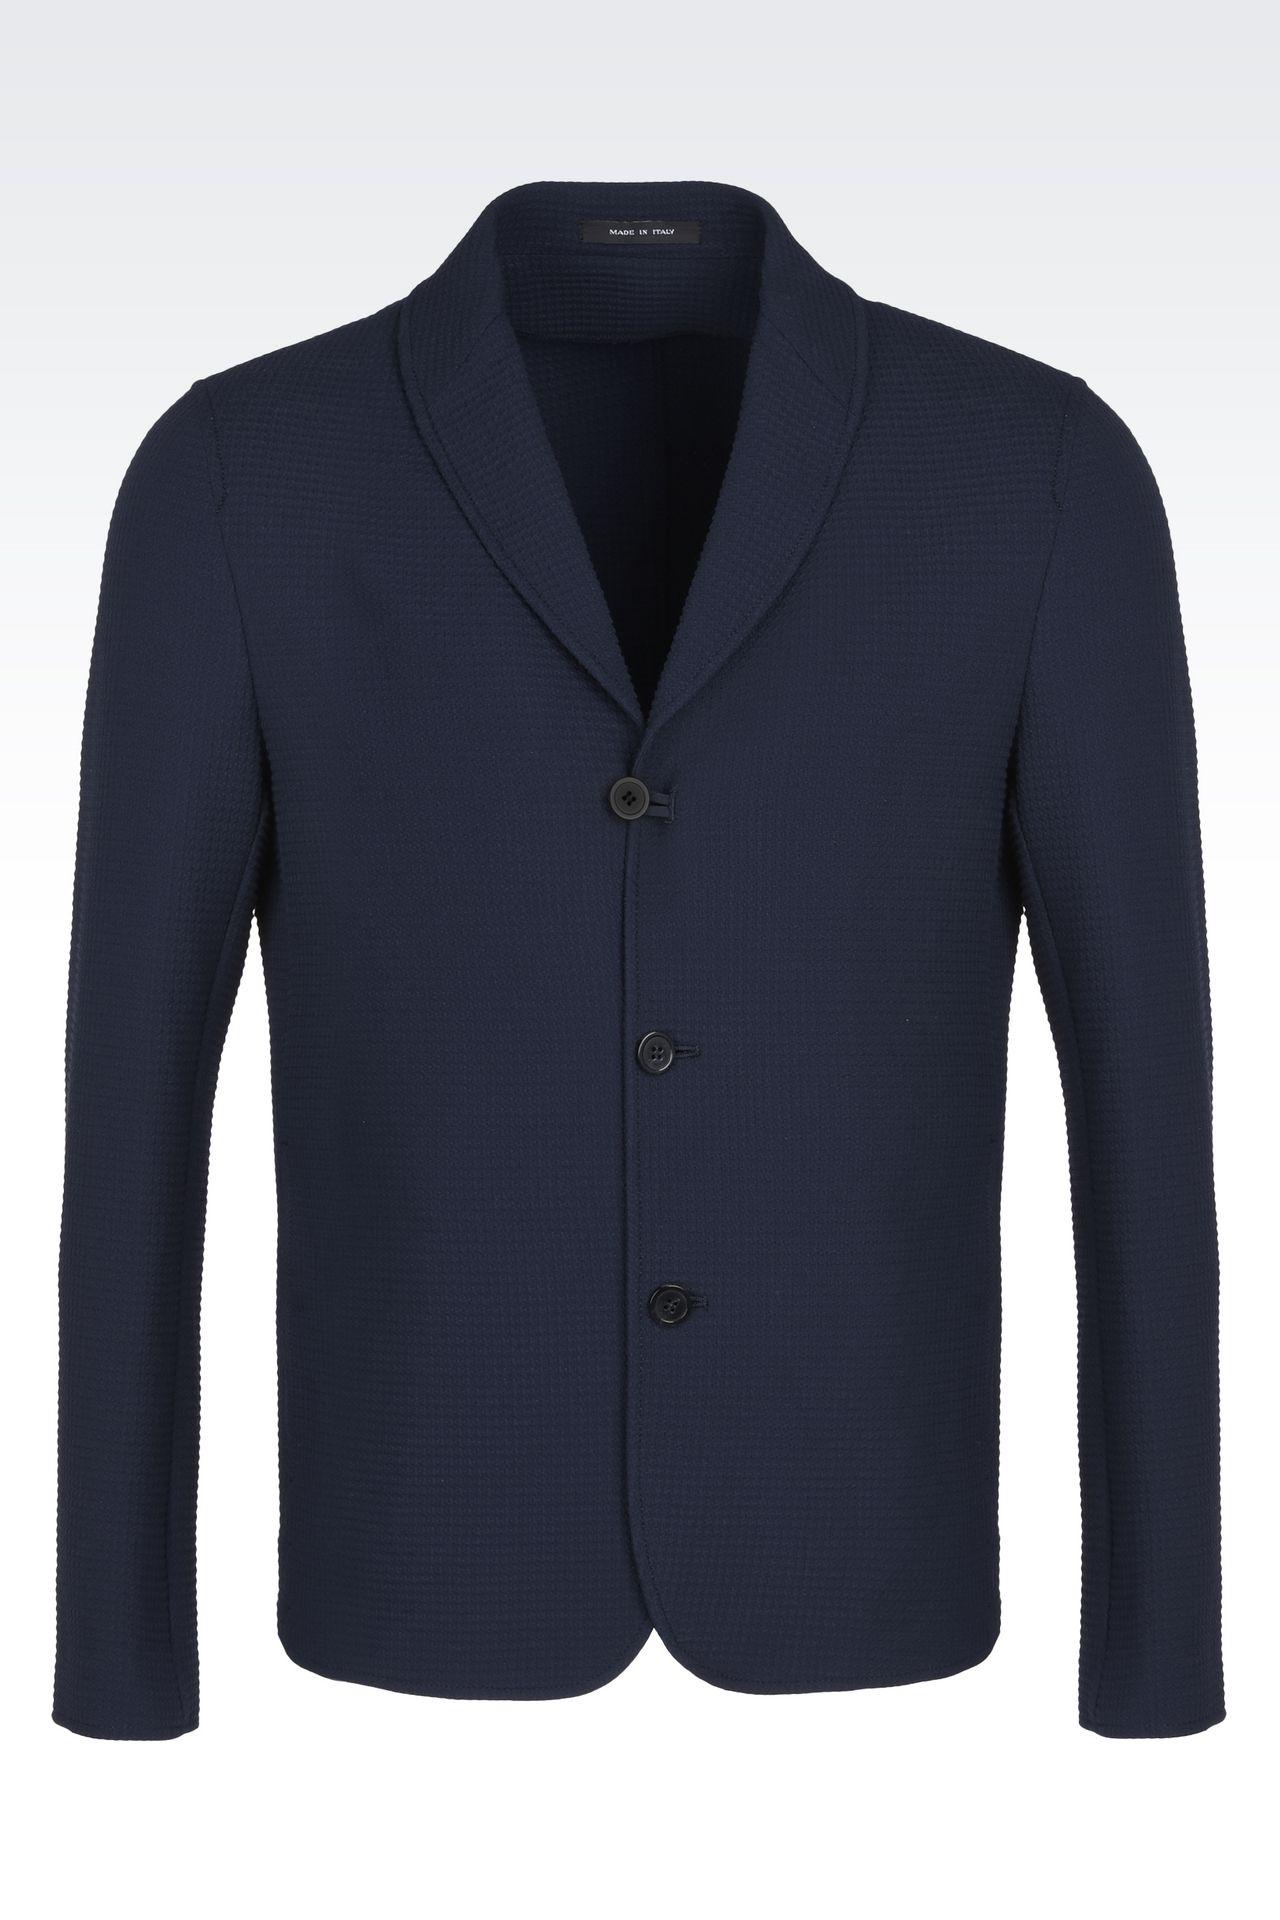 armani jackets men textured sweater jacket RYALGWN